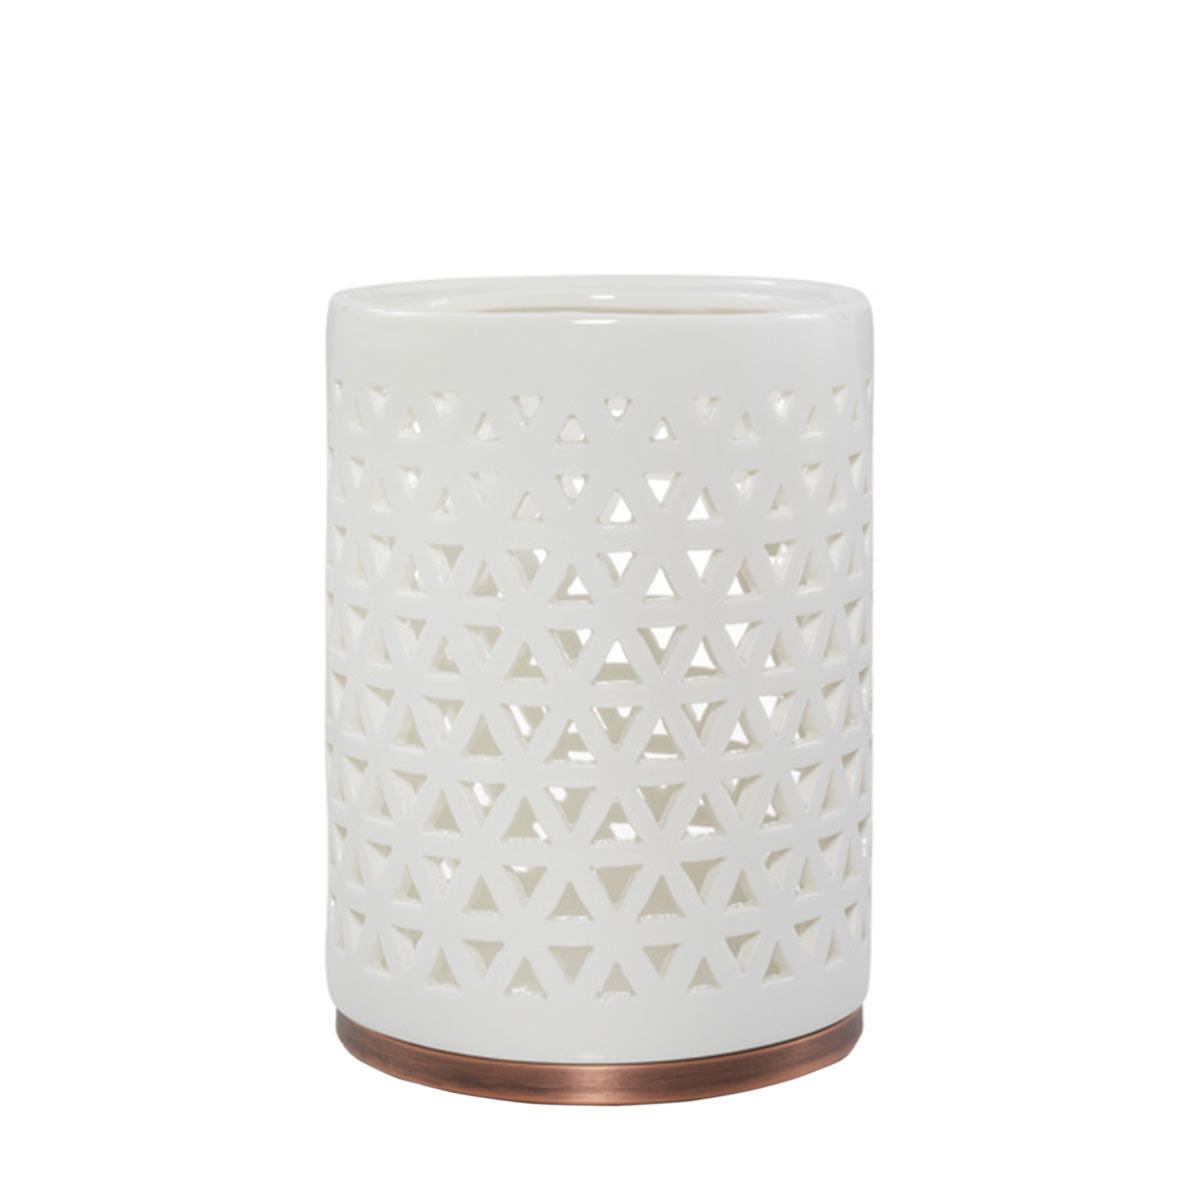 Belmont - Lattice Ceramic with Metal Base